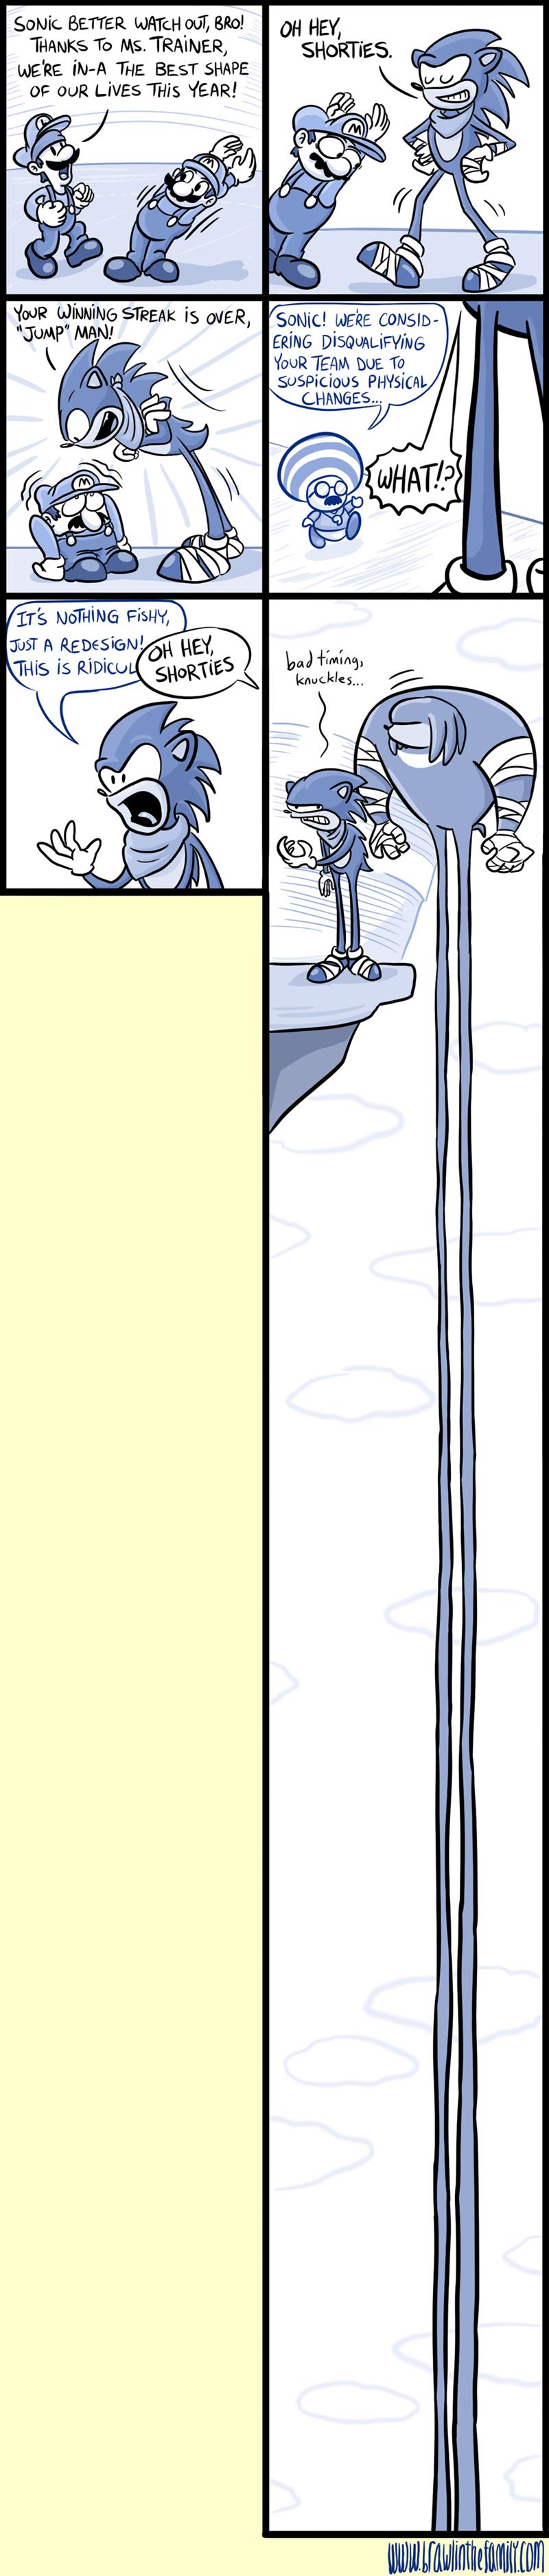 Sonic Boom (New Sonic cartoon) - Page 6 2014-02-11-544-Sochi